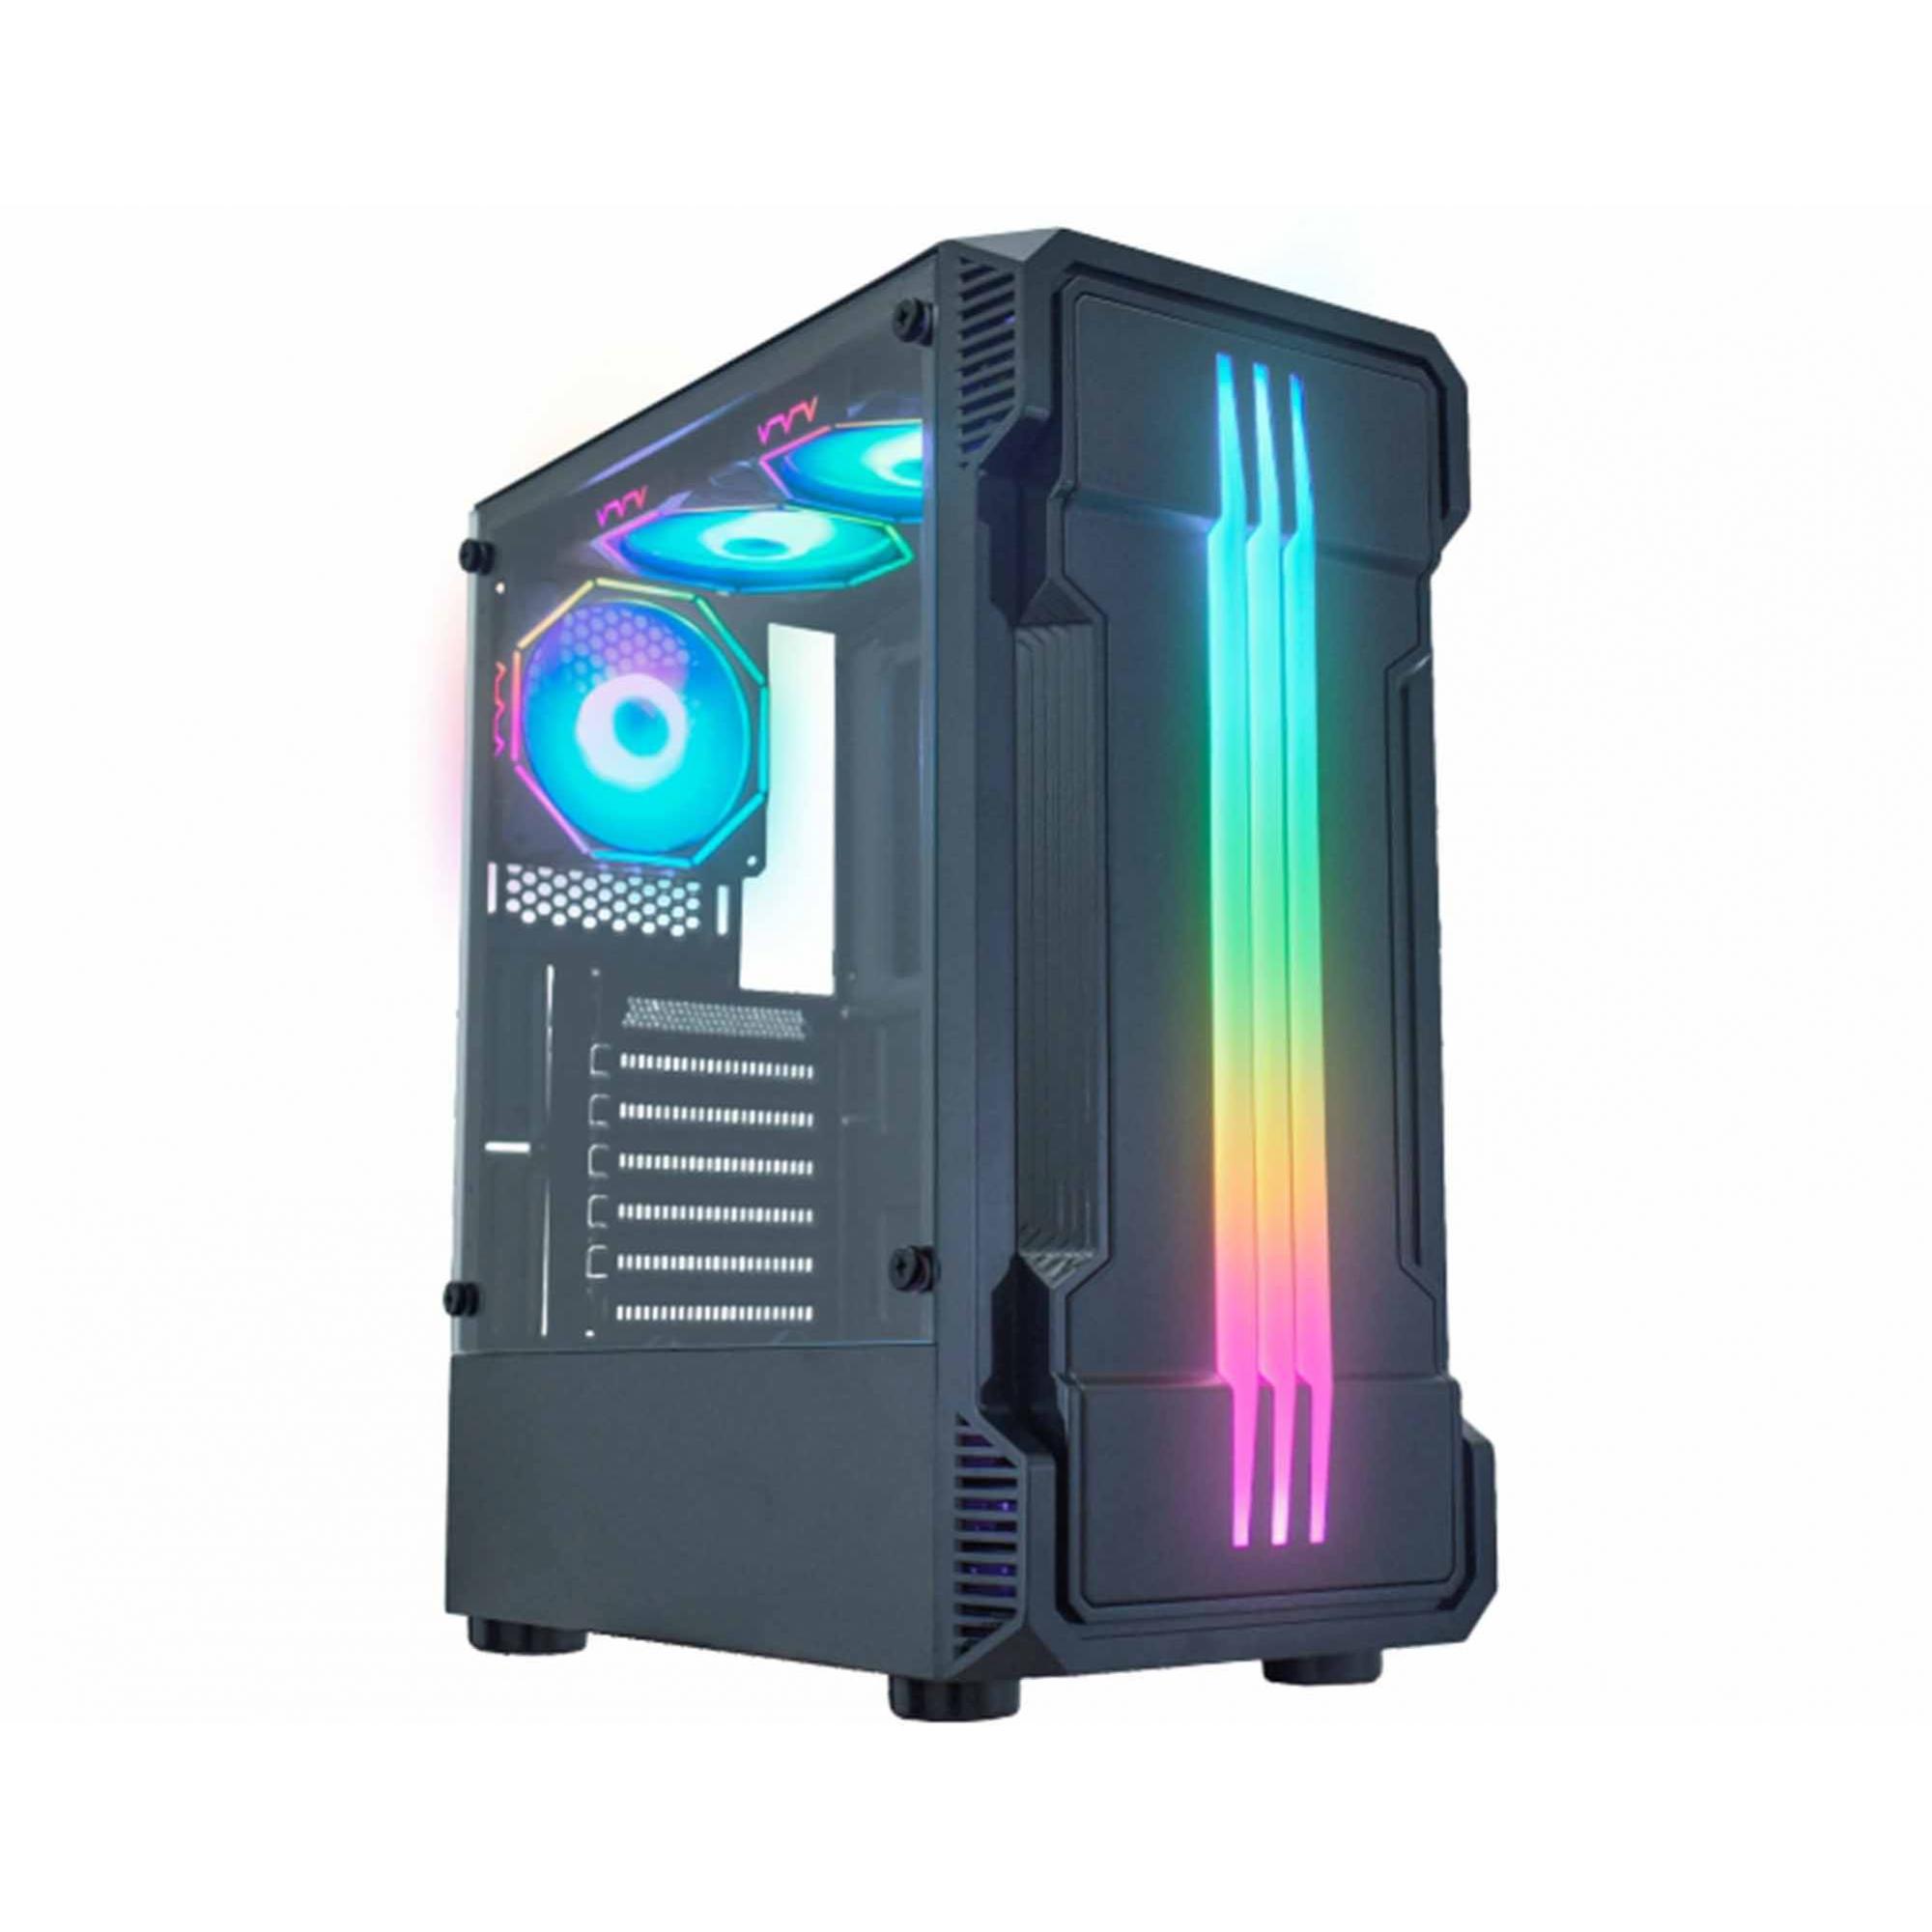 Computador Freefire Fatality Ryzen   - Fatality